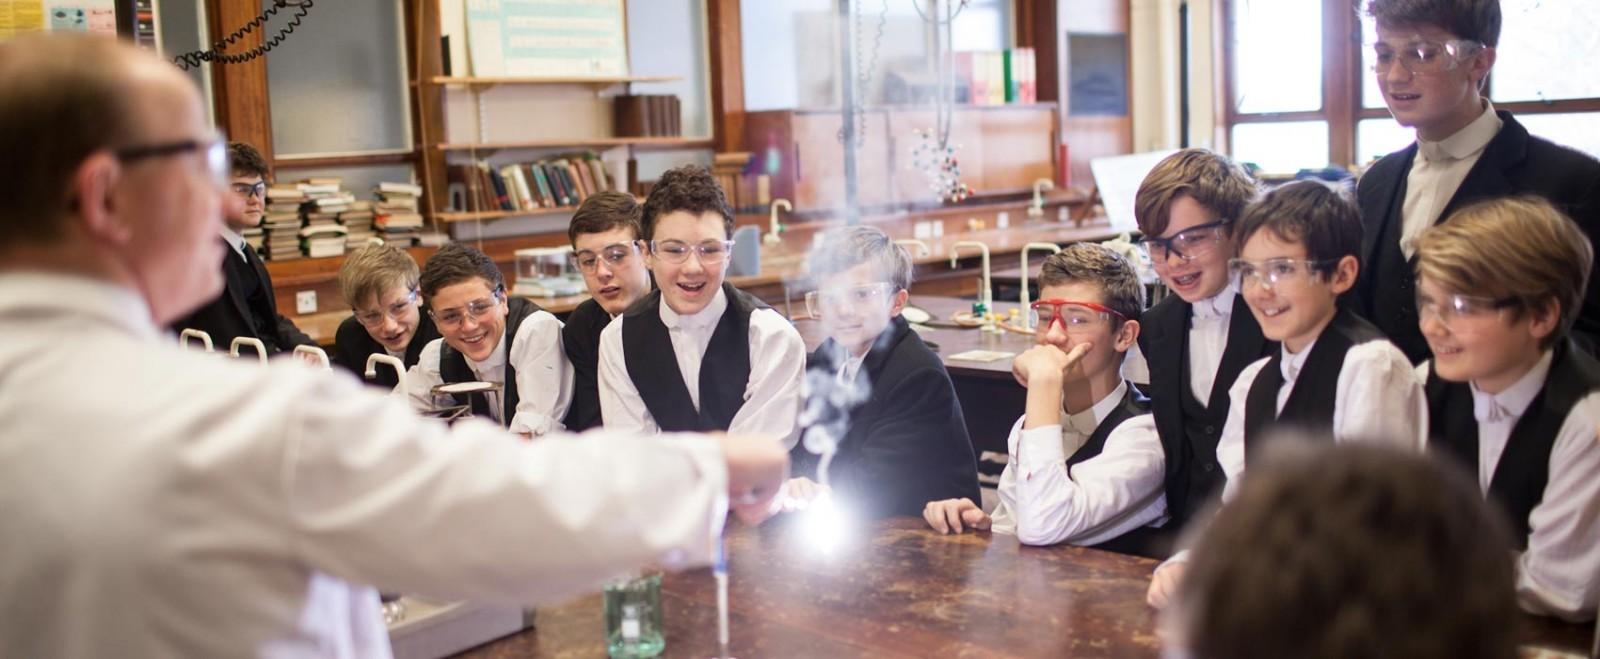 behavioral education in public schools essay